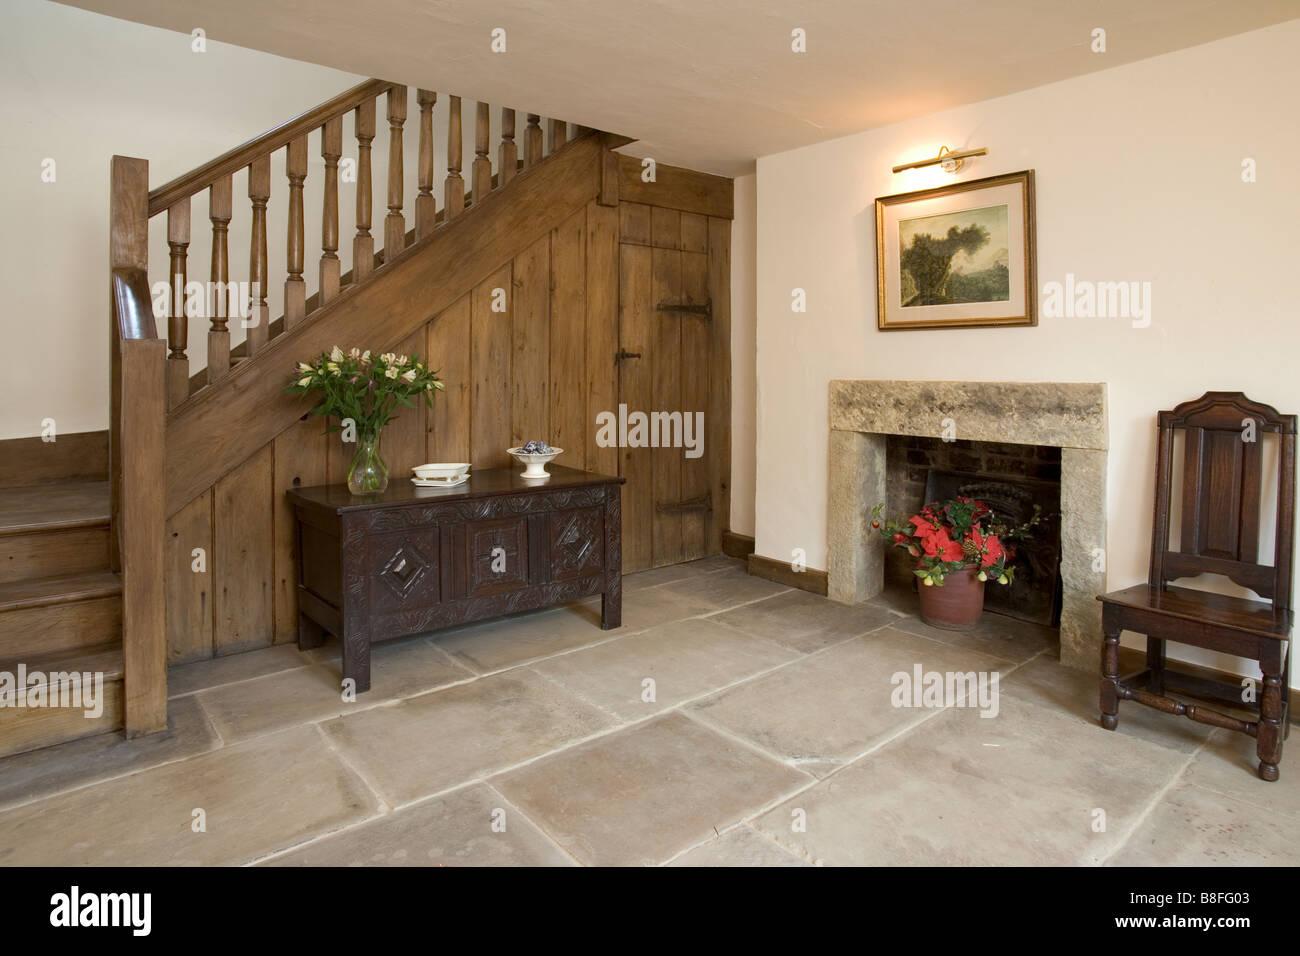 A House Interior, Entrance Hall, Flagstone Floor.   Stock Image